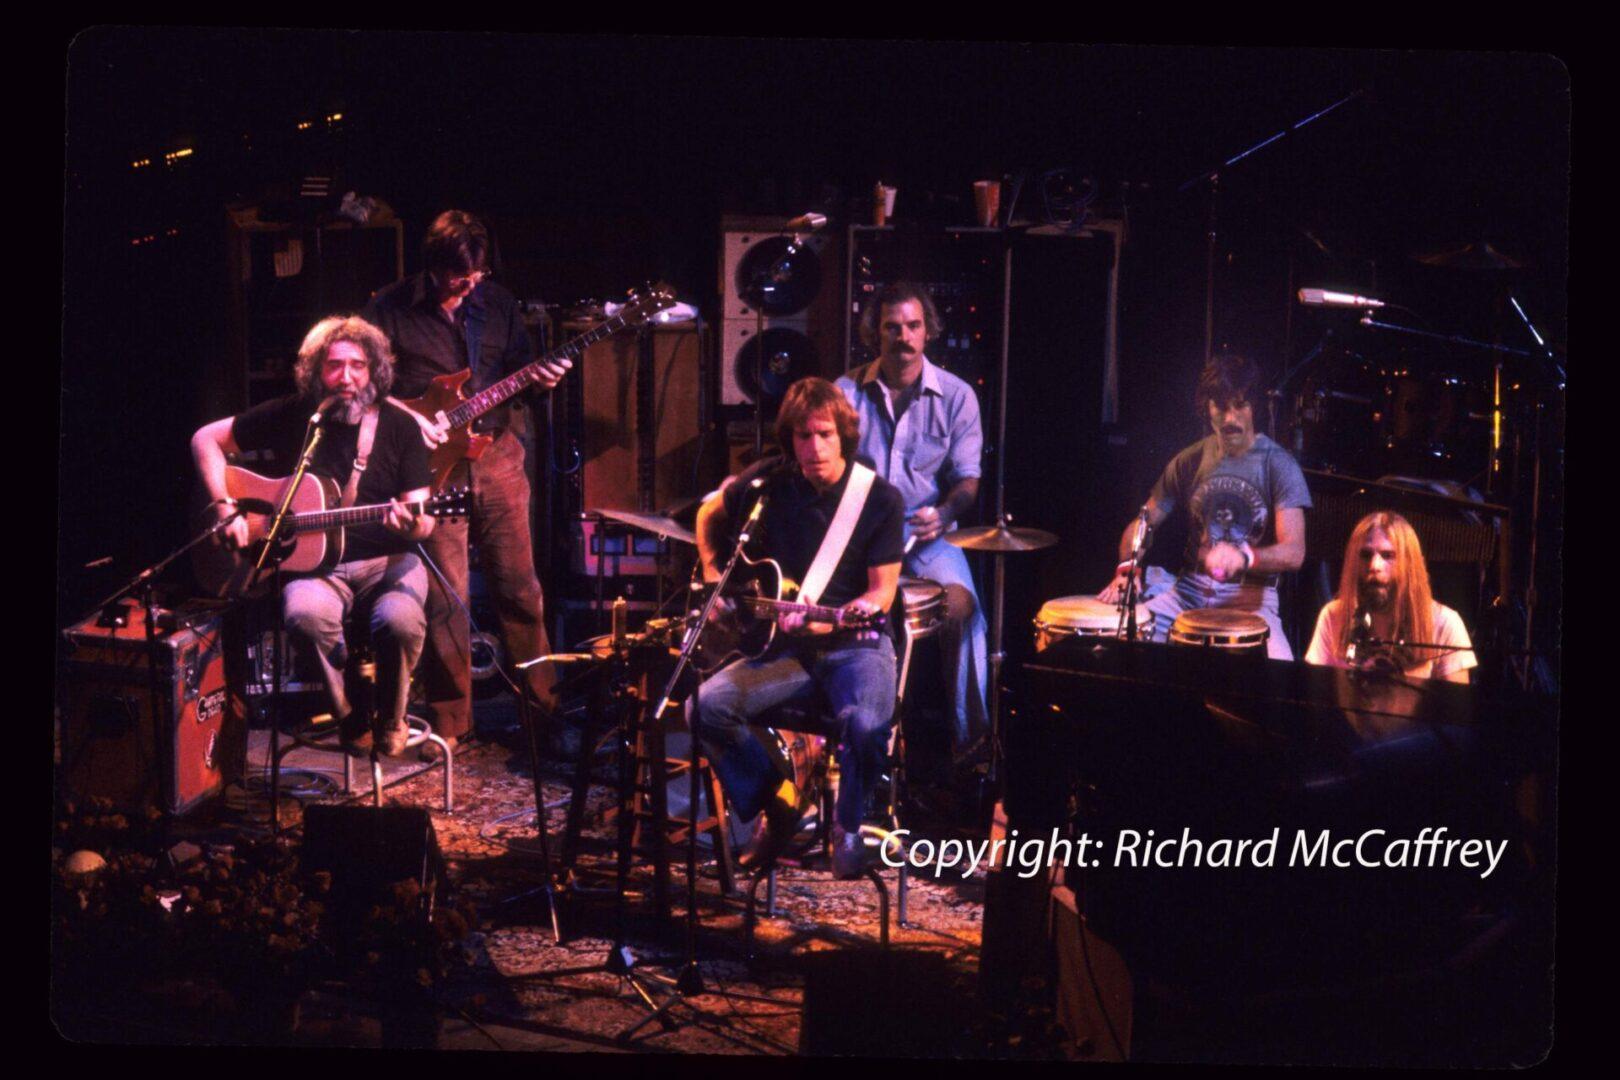 Grateful Dead; Jerry Garcia, Phil Lesh, Bob Weir, Bill Kreutzmann, Mickey Hart, Brent Mydland; Warfield Theatre; SF CA 1980